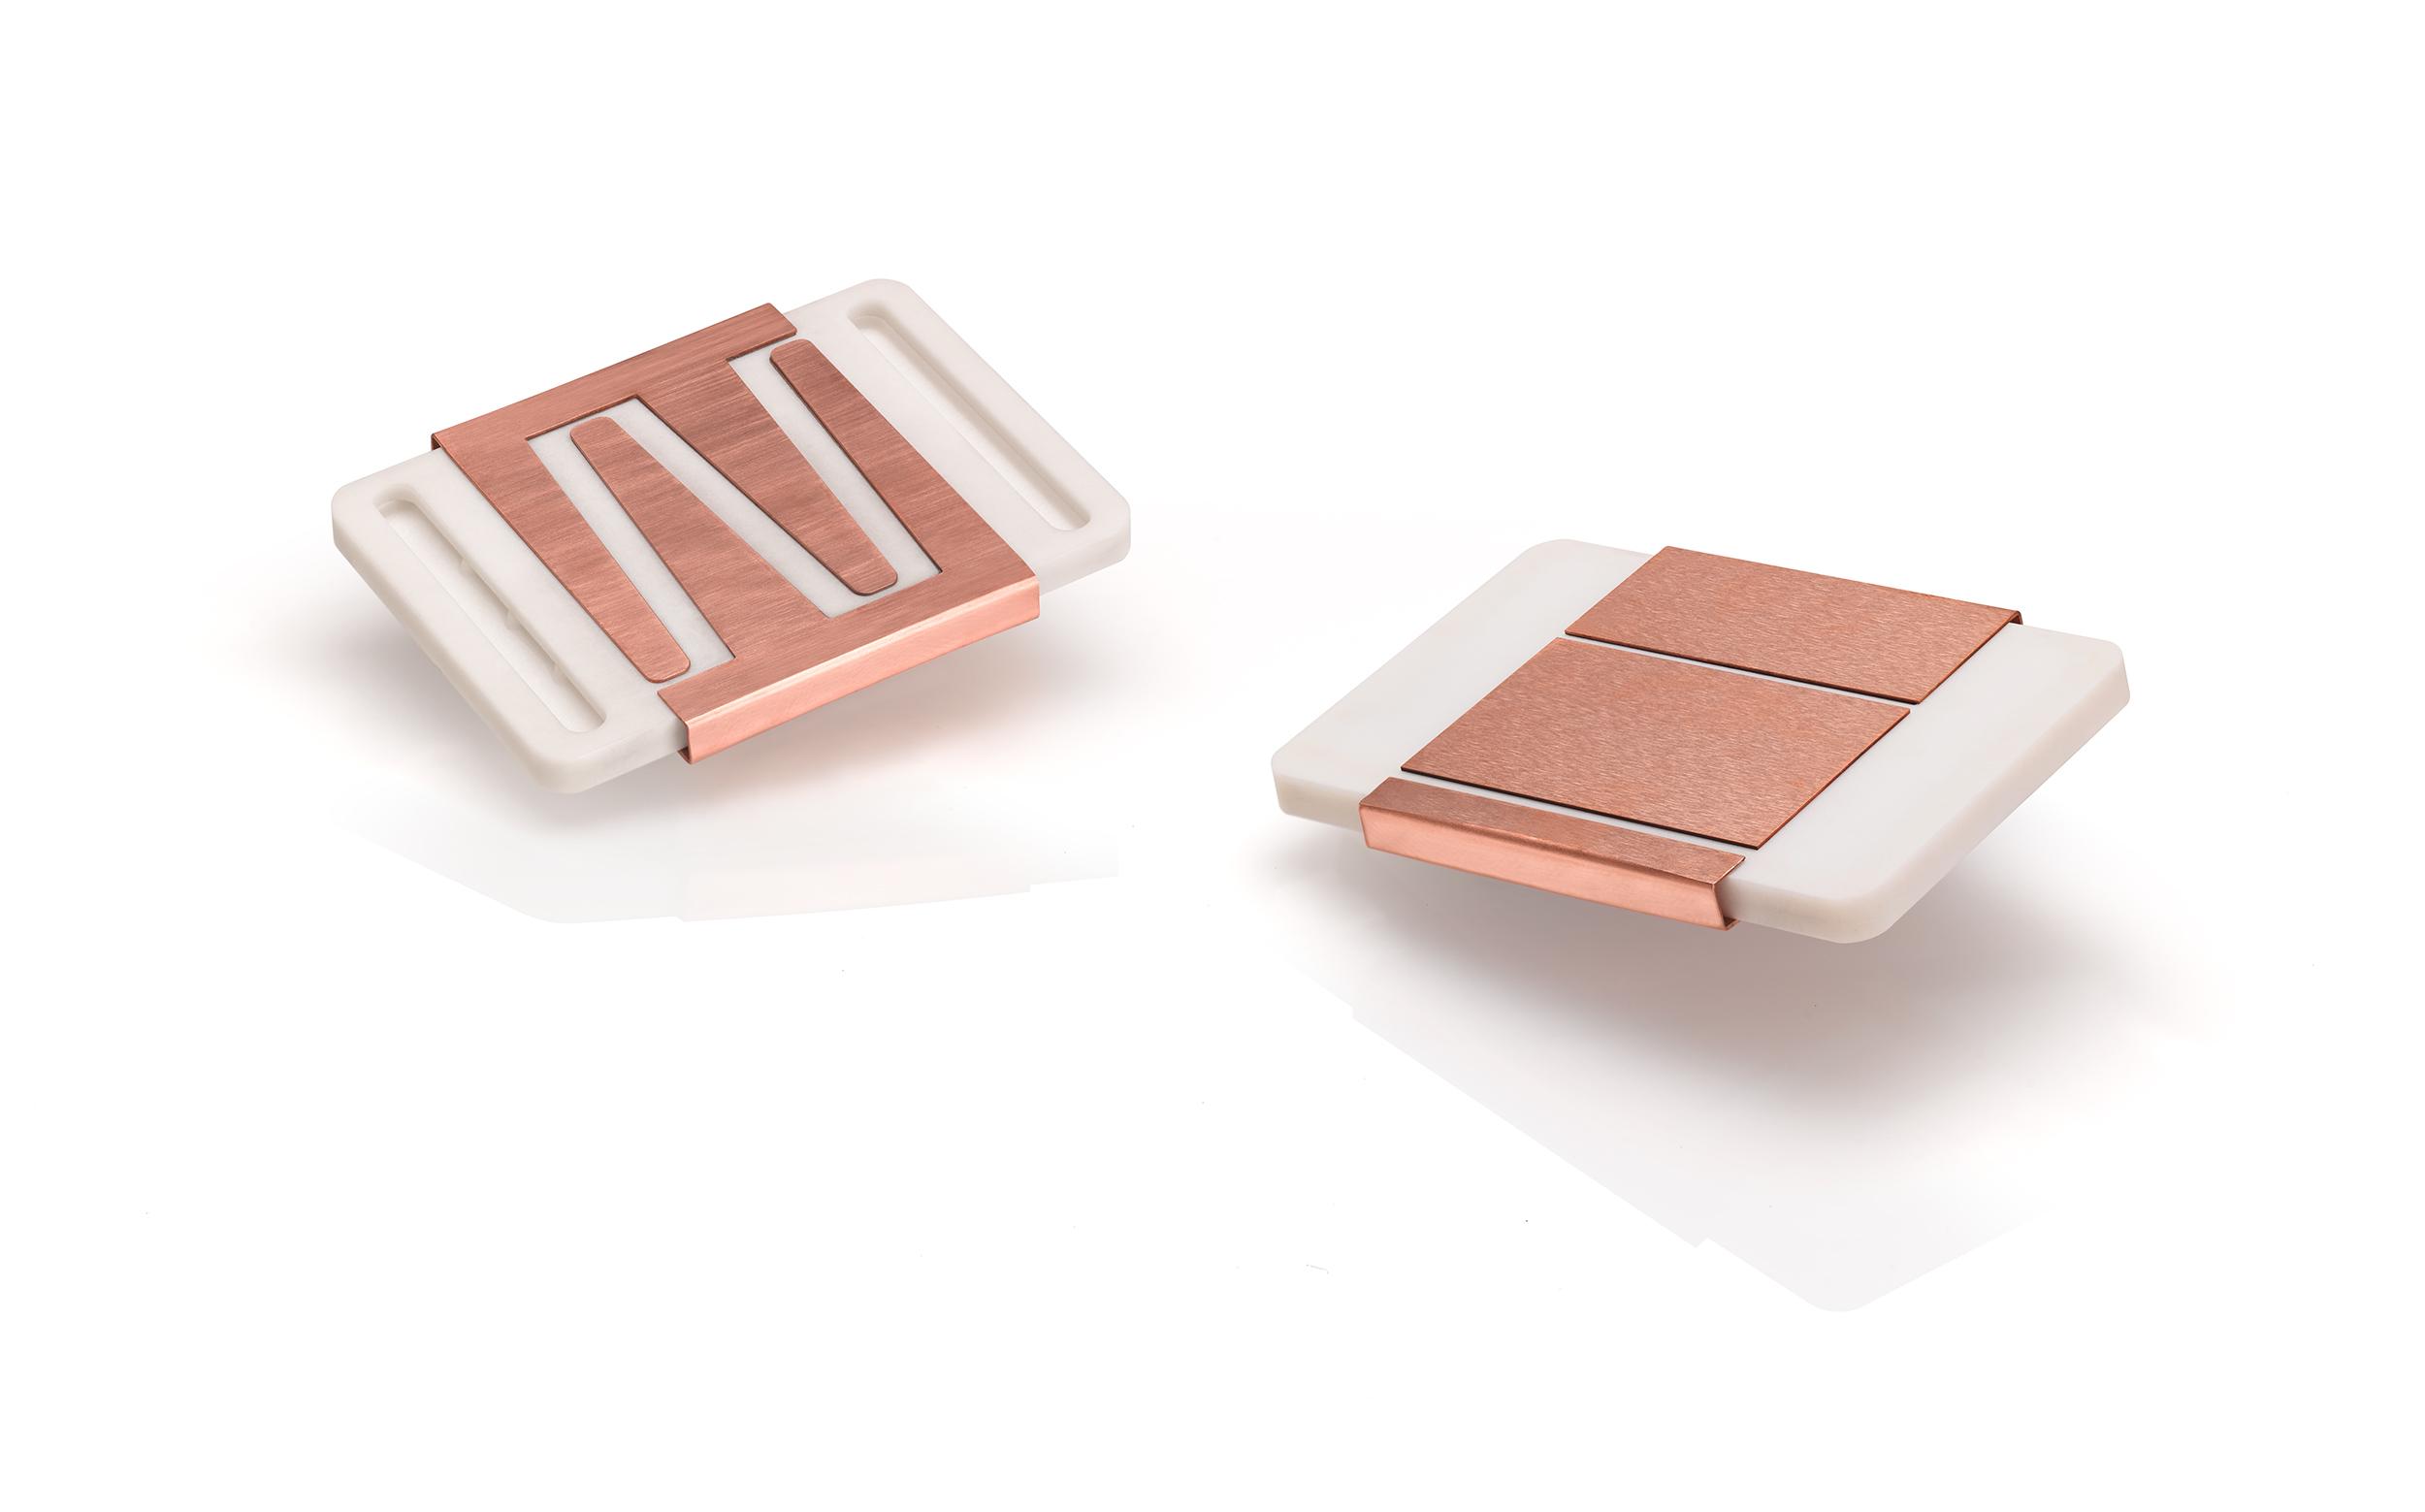 The ceramic power modules. Photo via CeramTec.